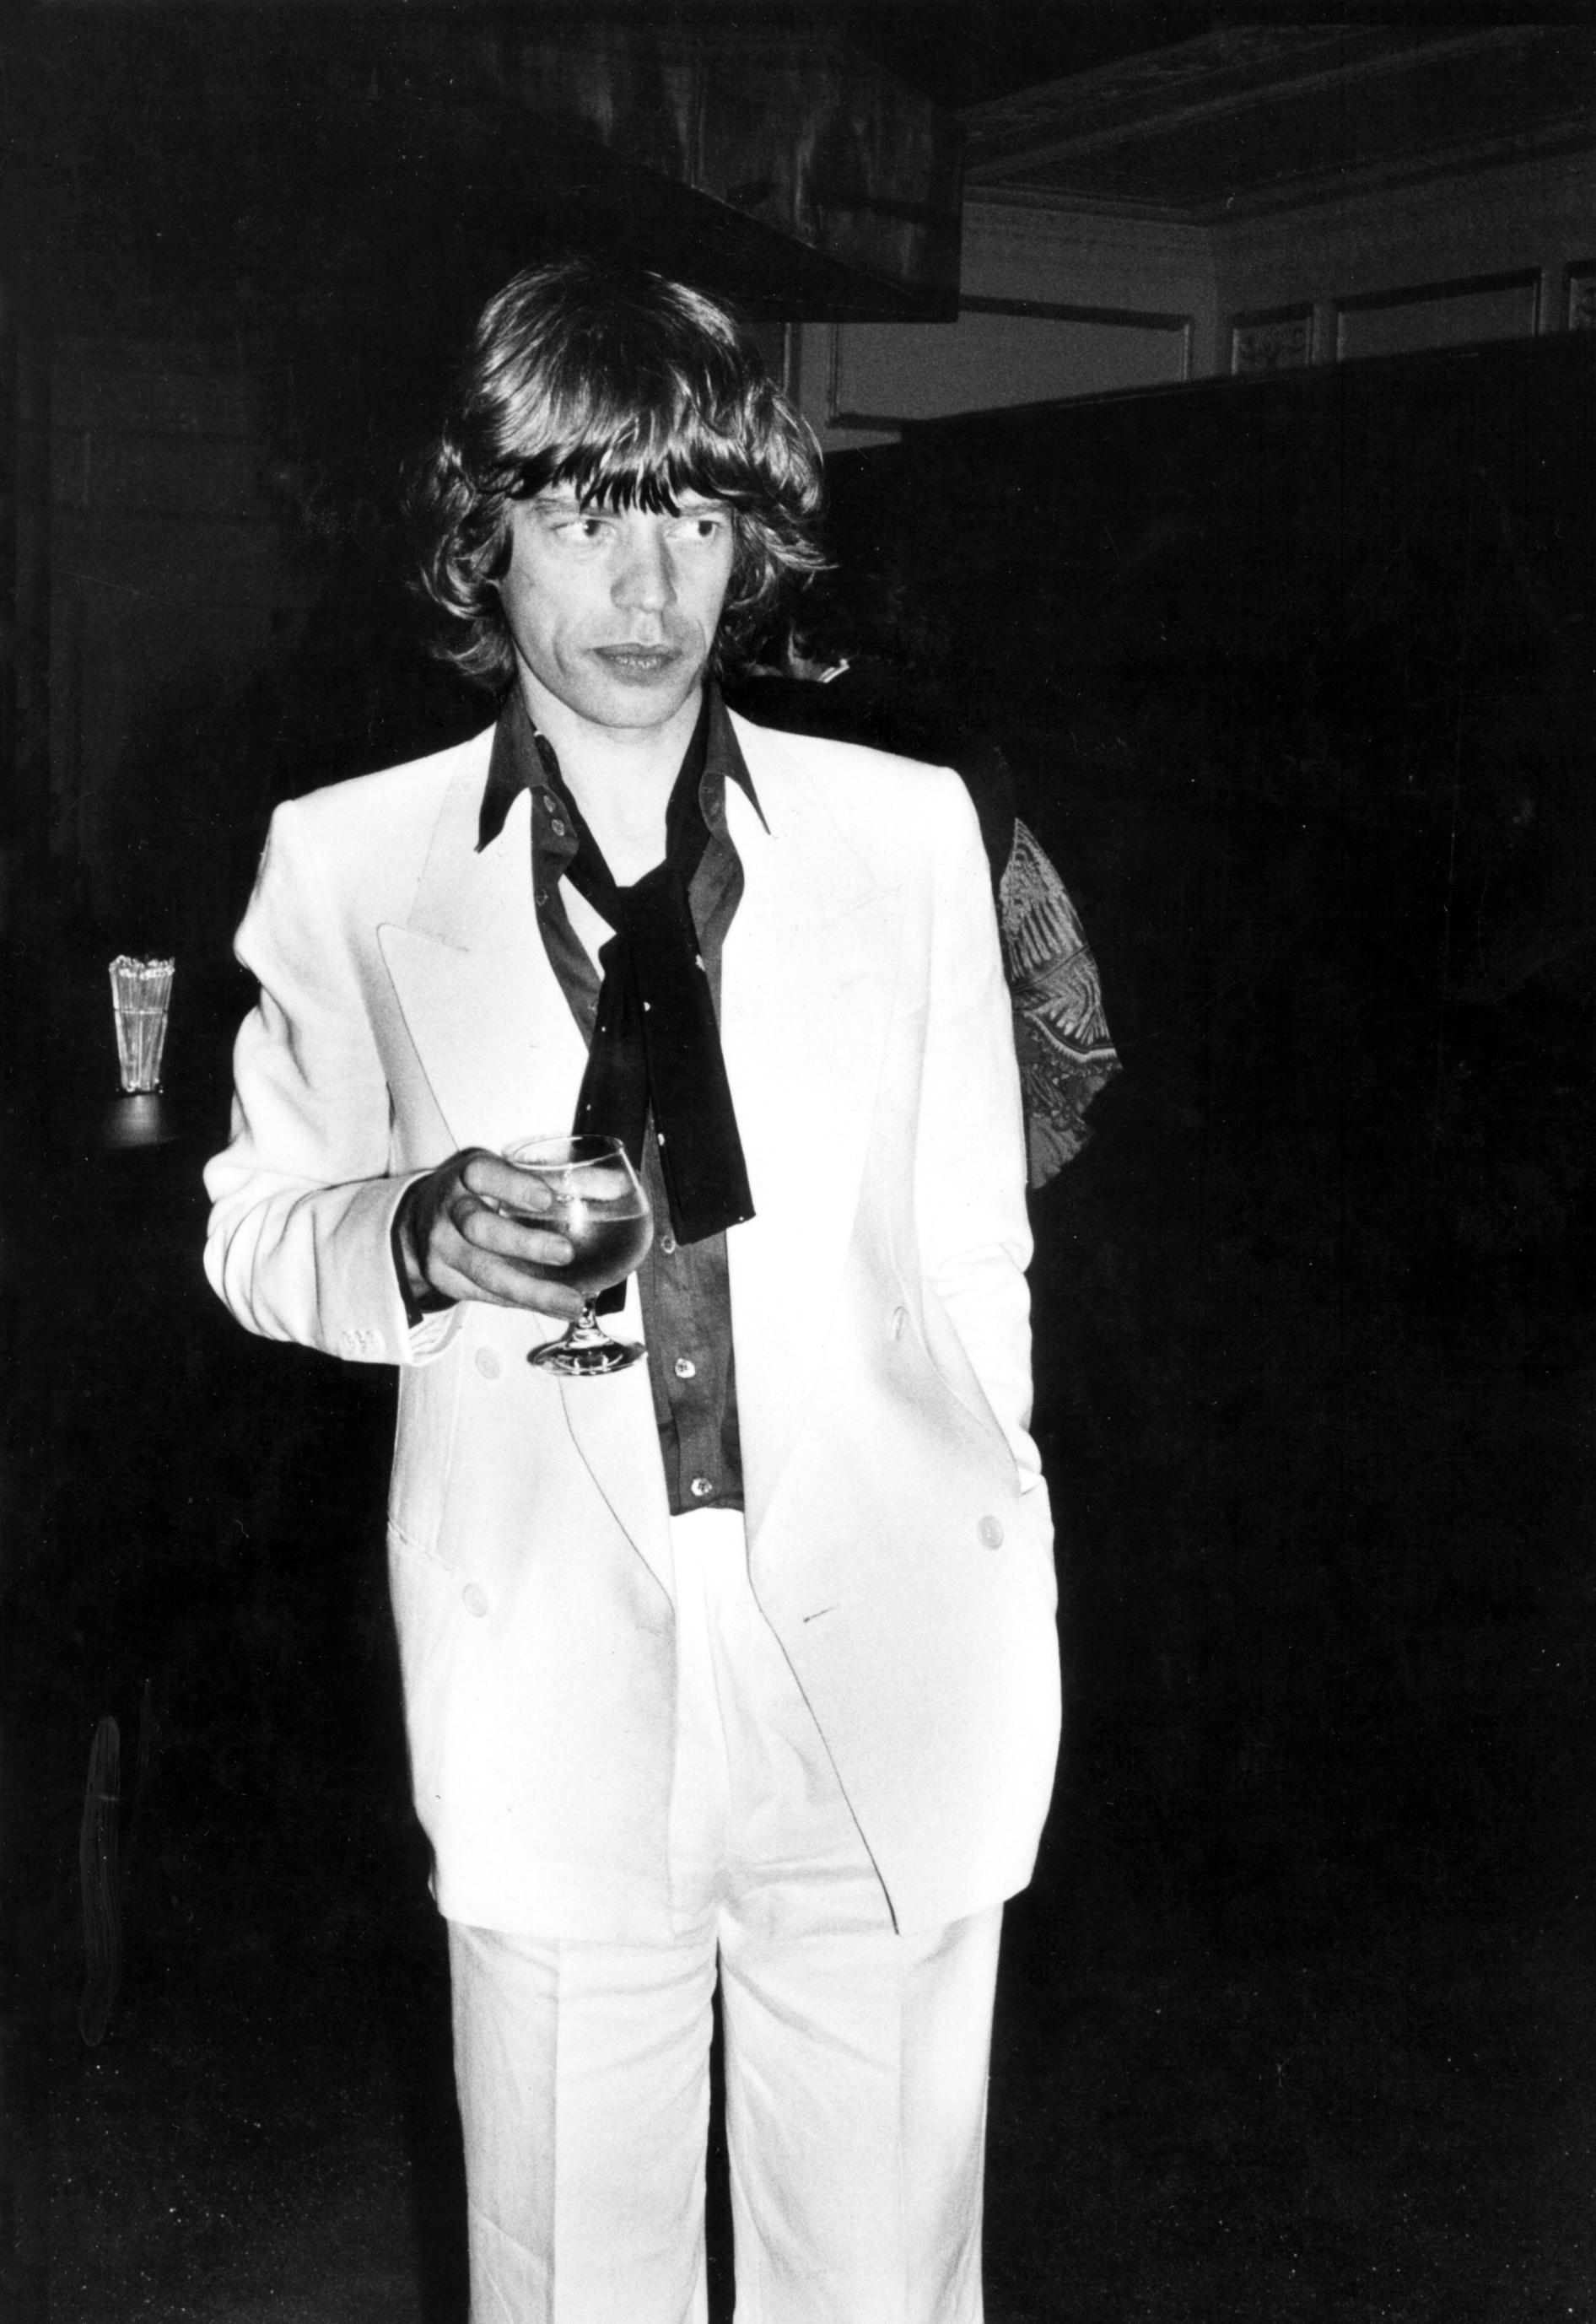 Rose Hartman - Mick Jagger at Bianca's birthday.jpeg